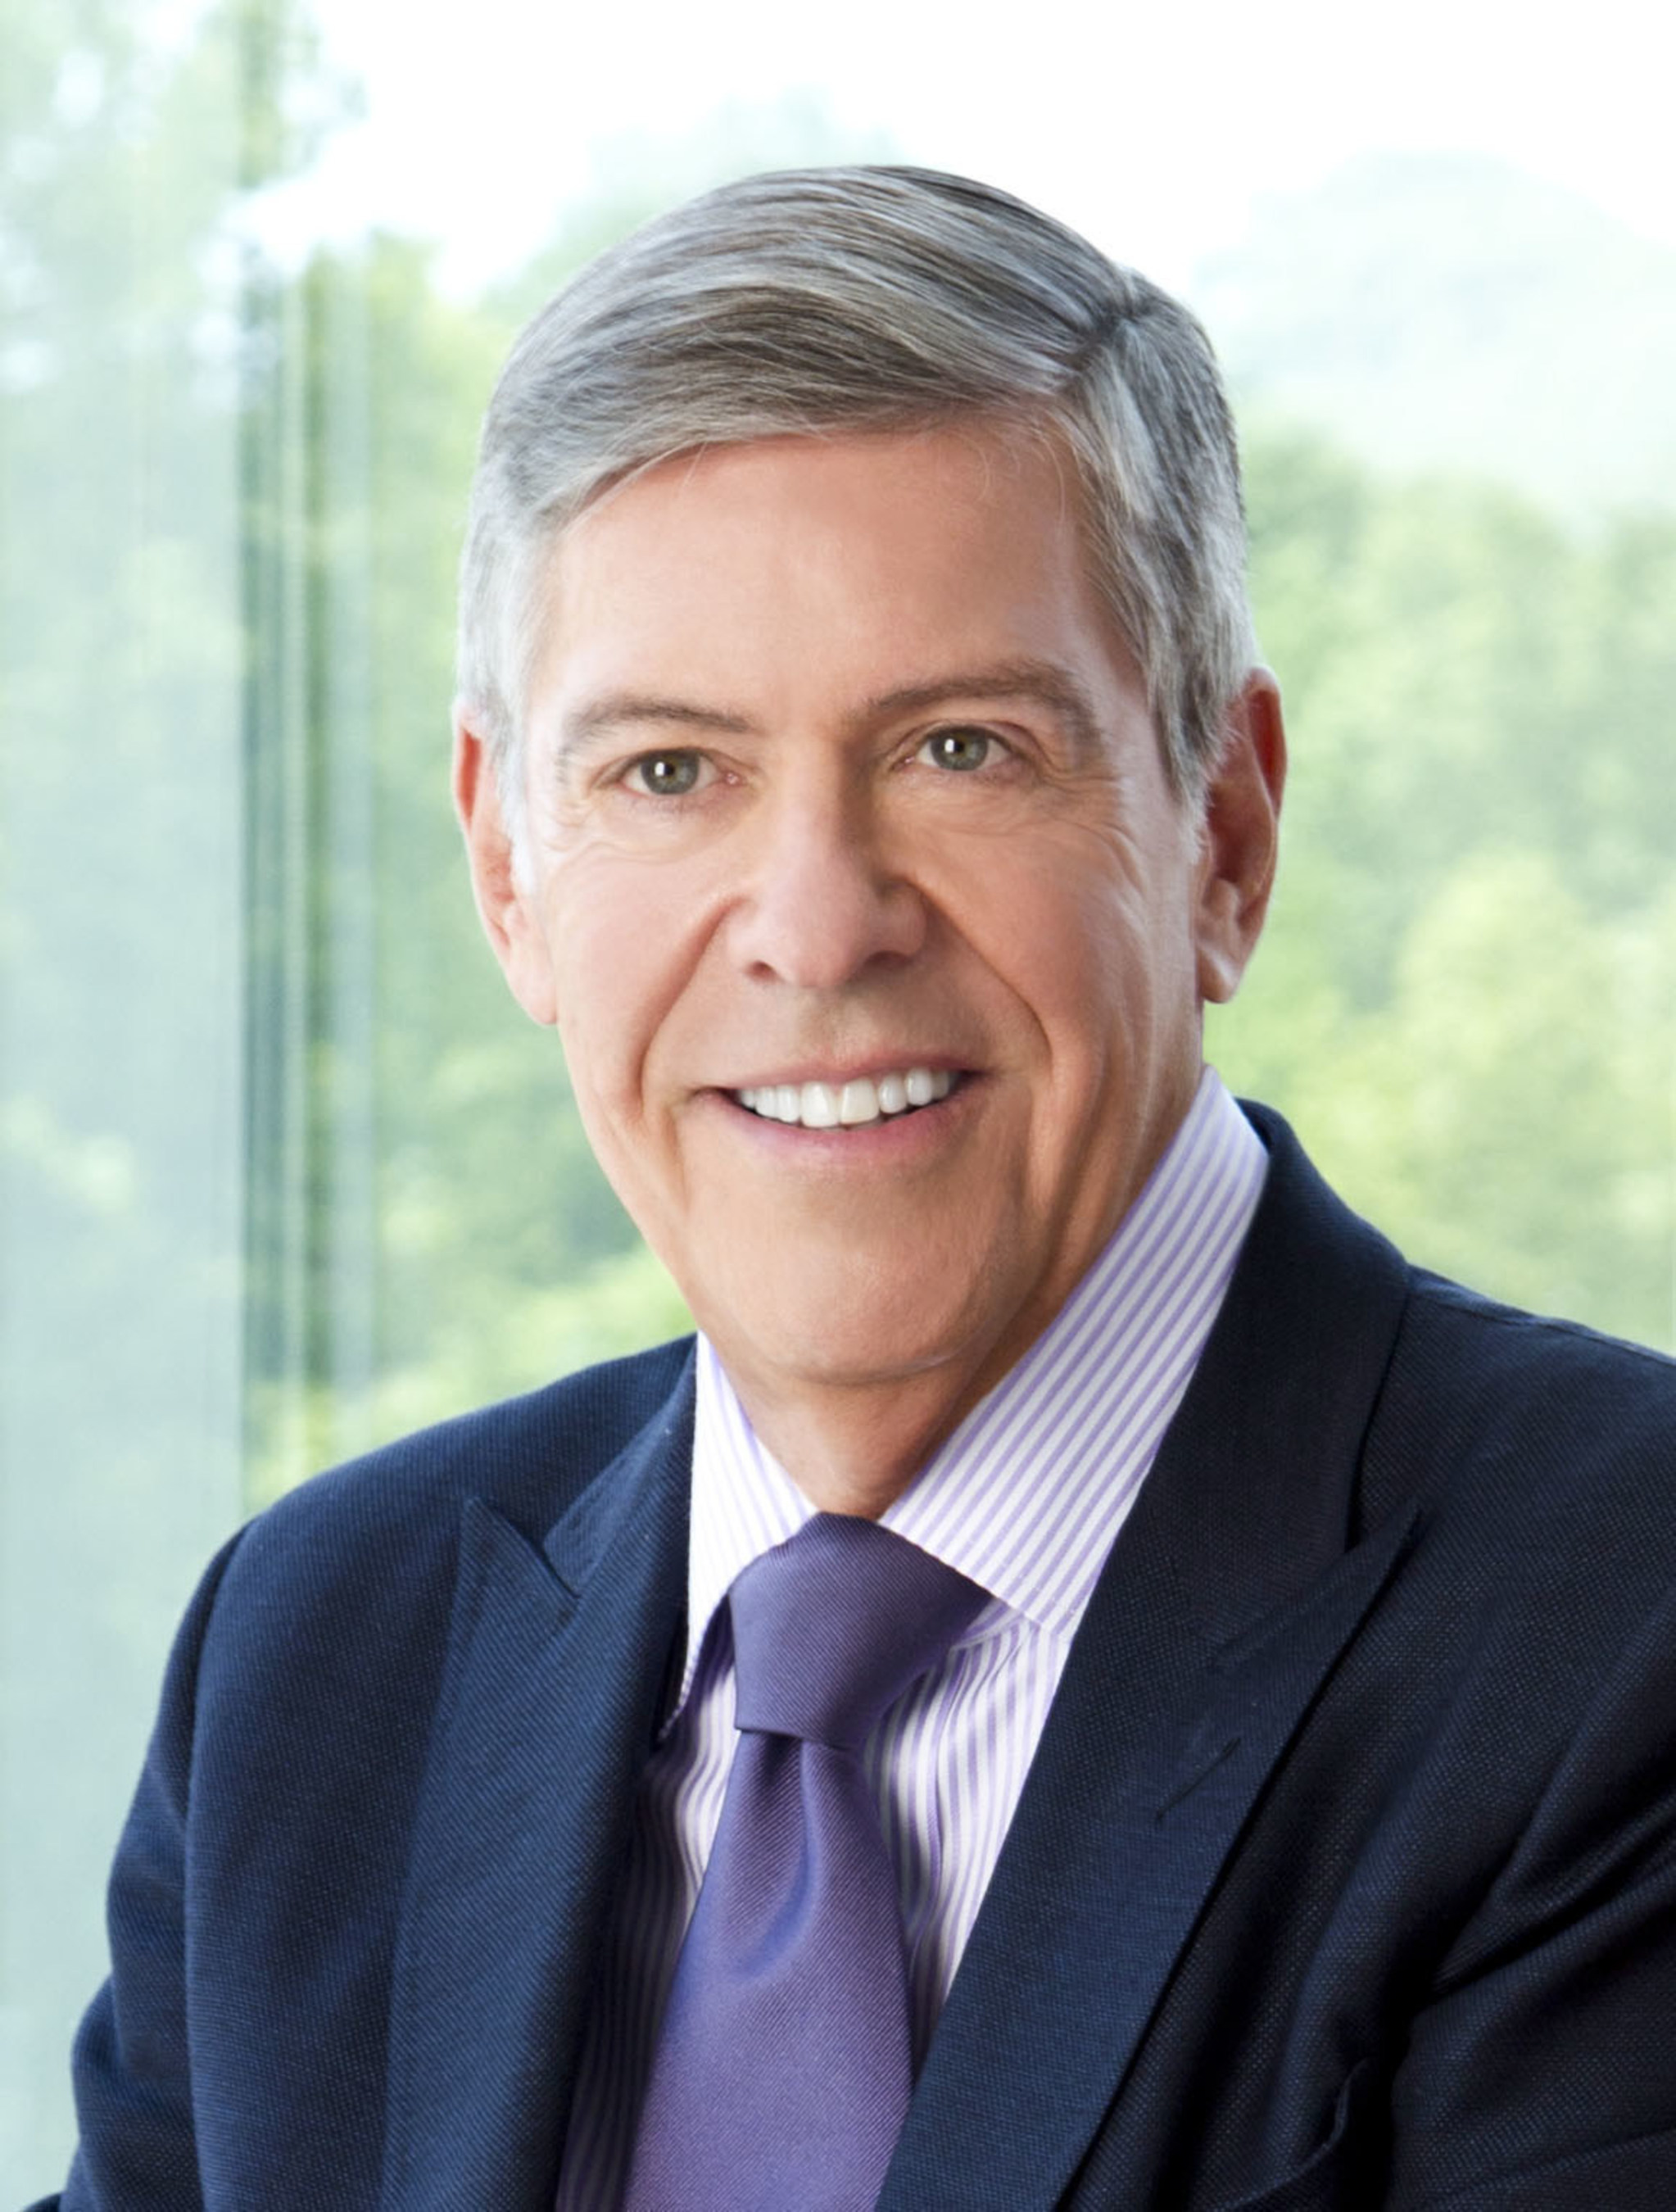 Steve Tanger, President and CEO of Tanger Outlets